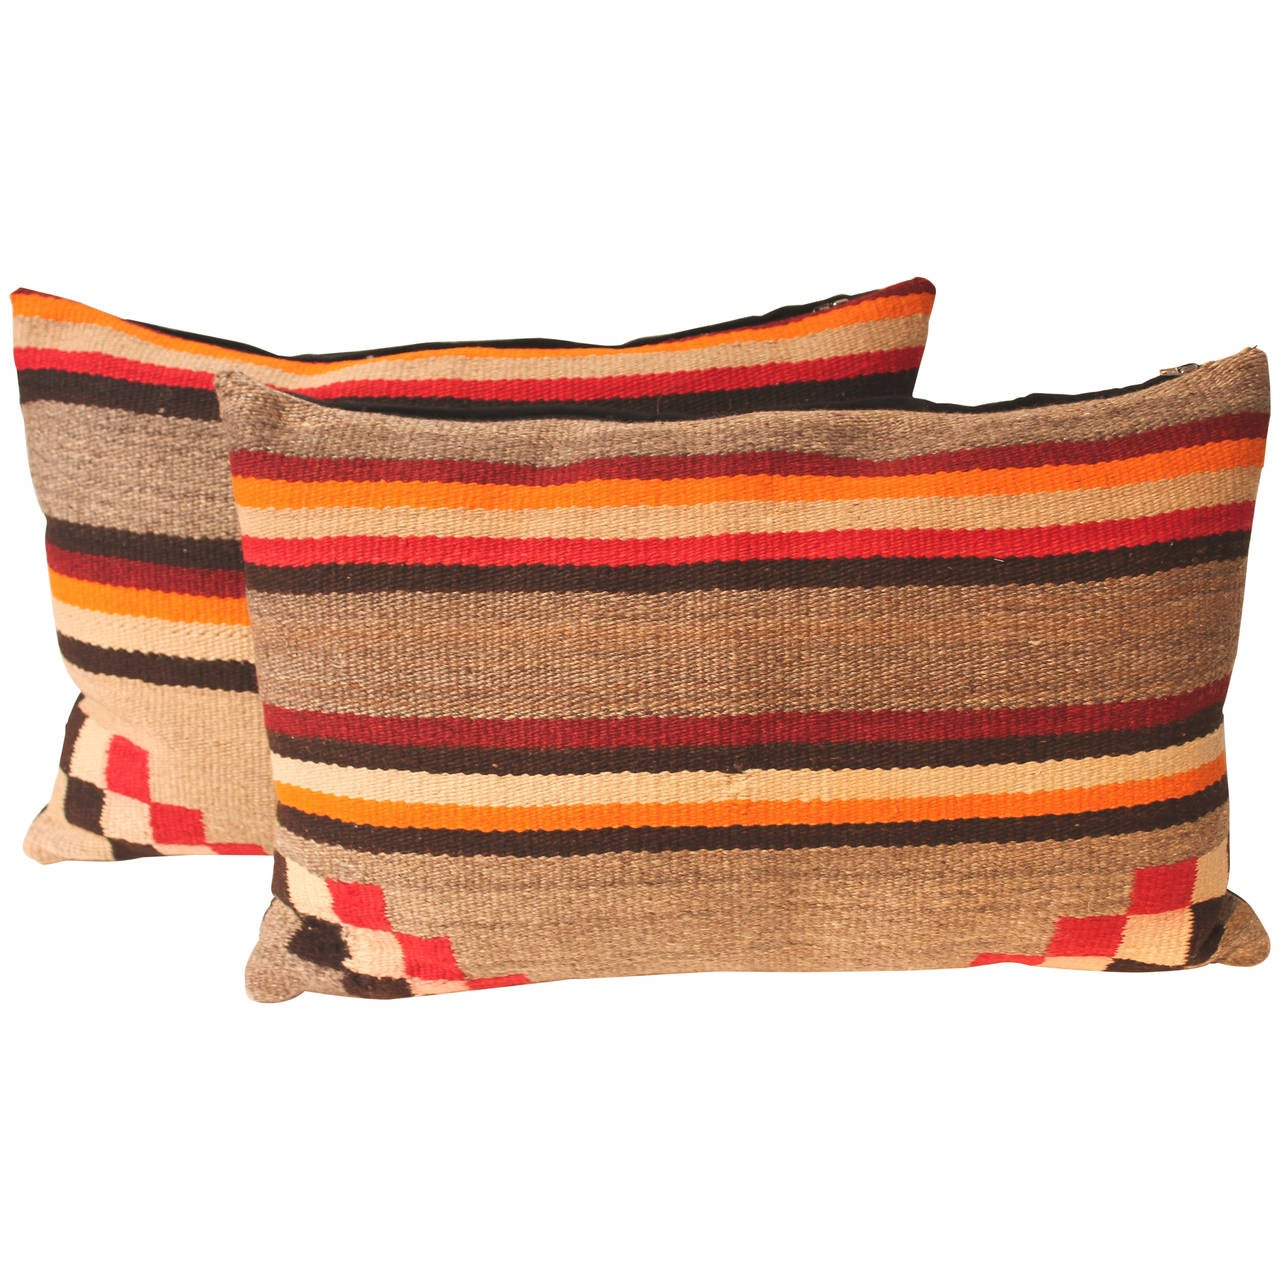 Pair Of Navajo Saddle Blanket Weaving Pillows At 1stdibs